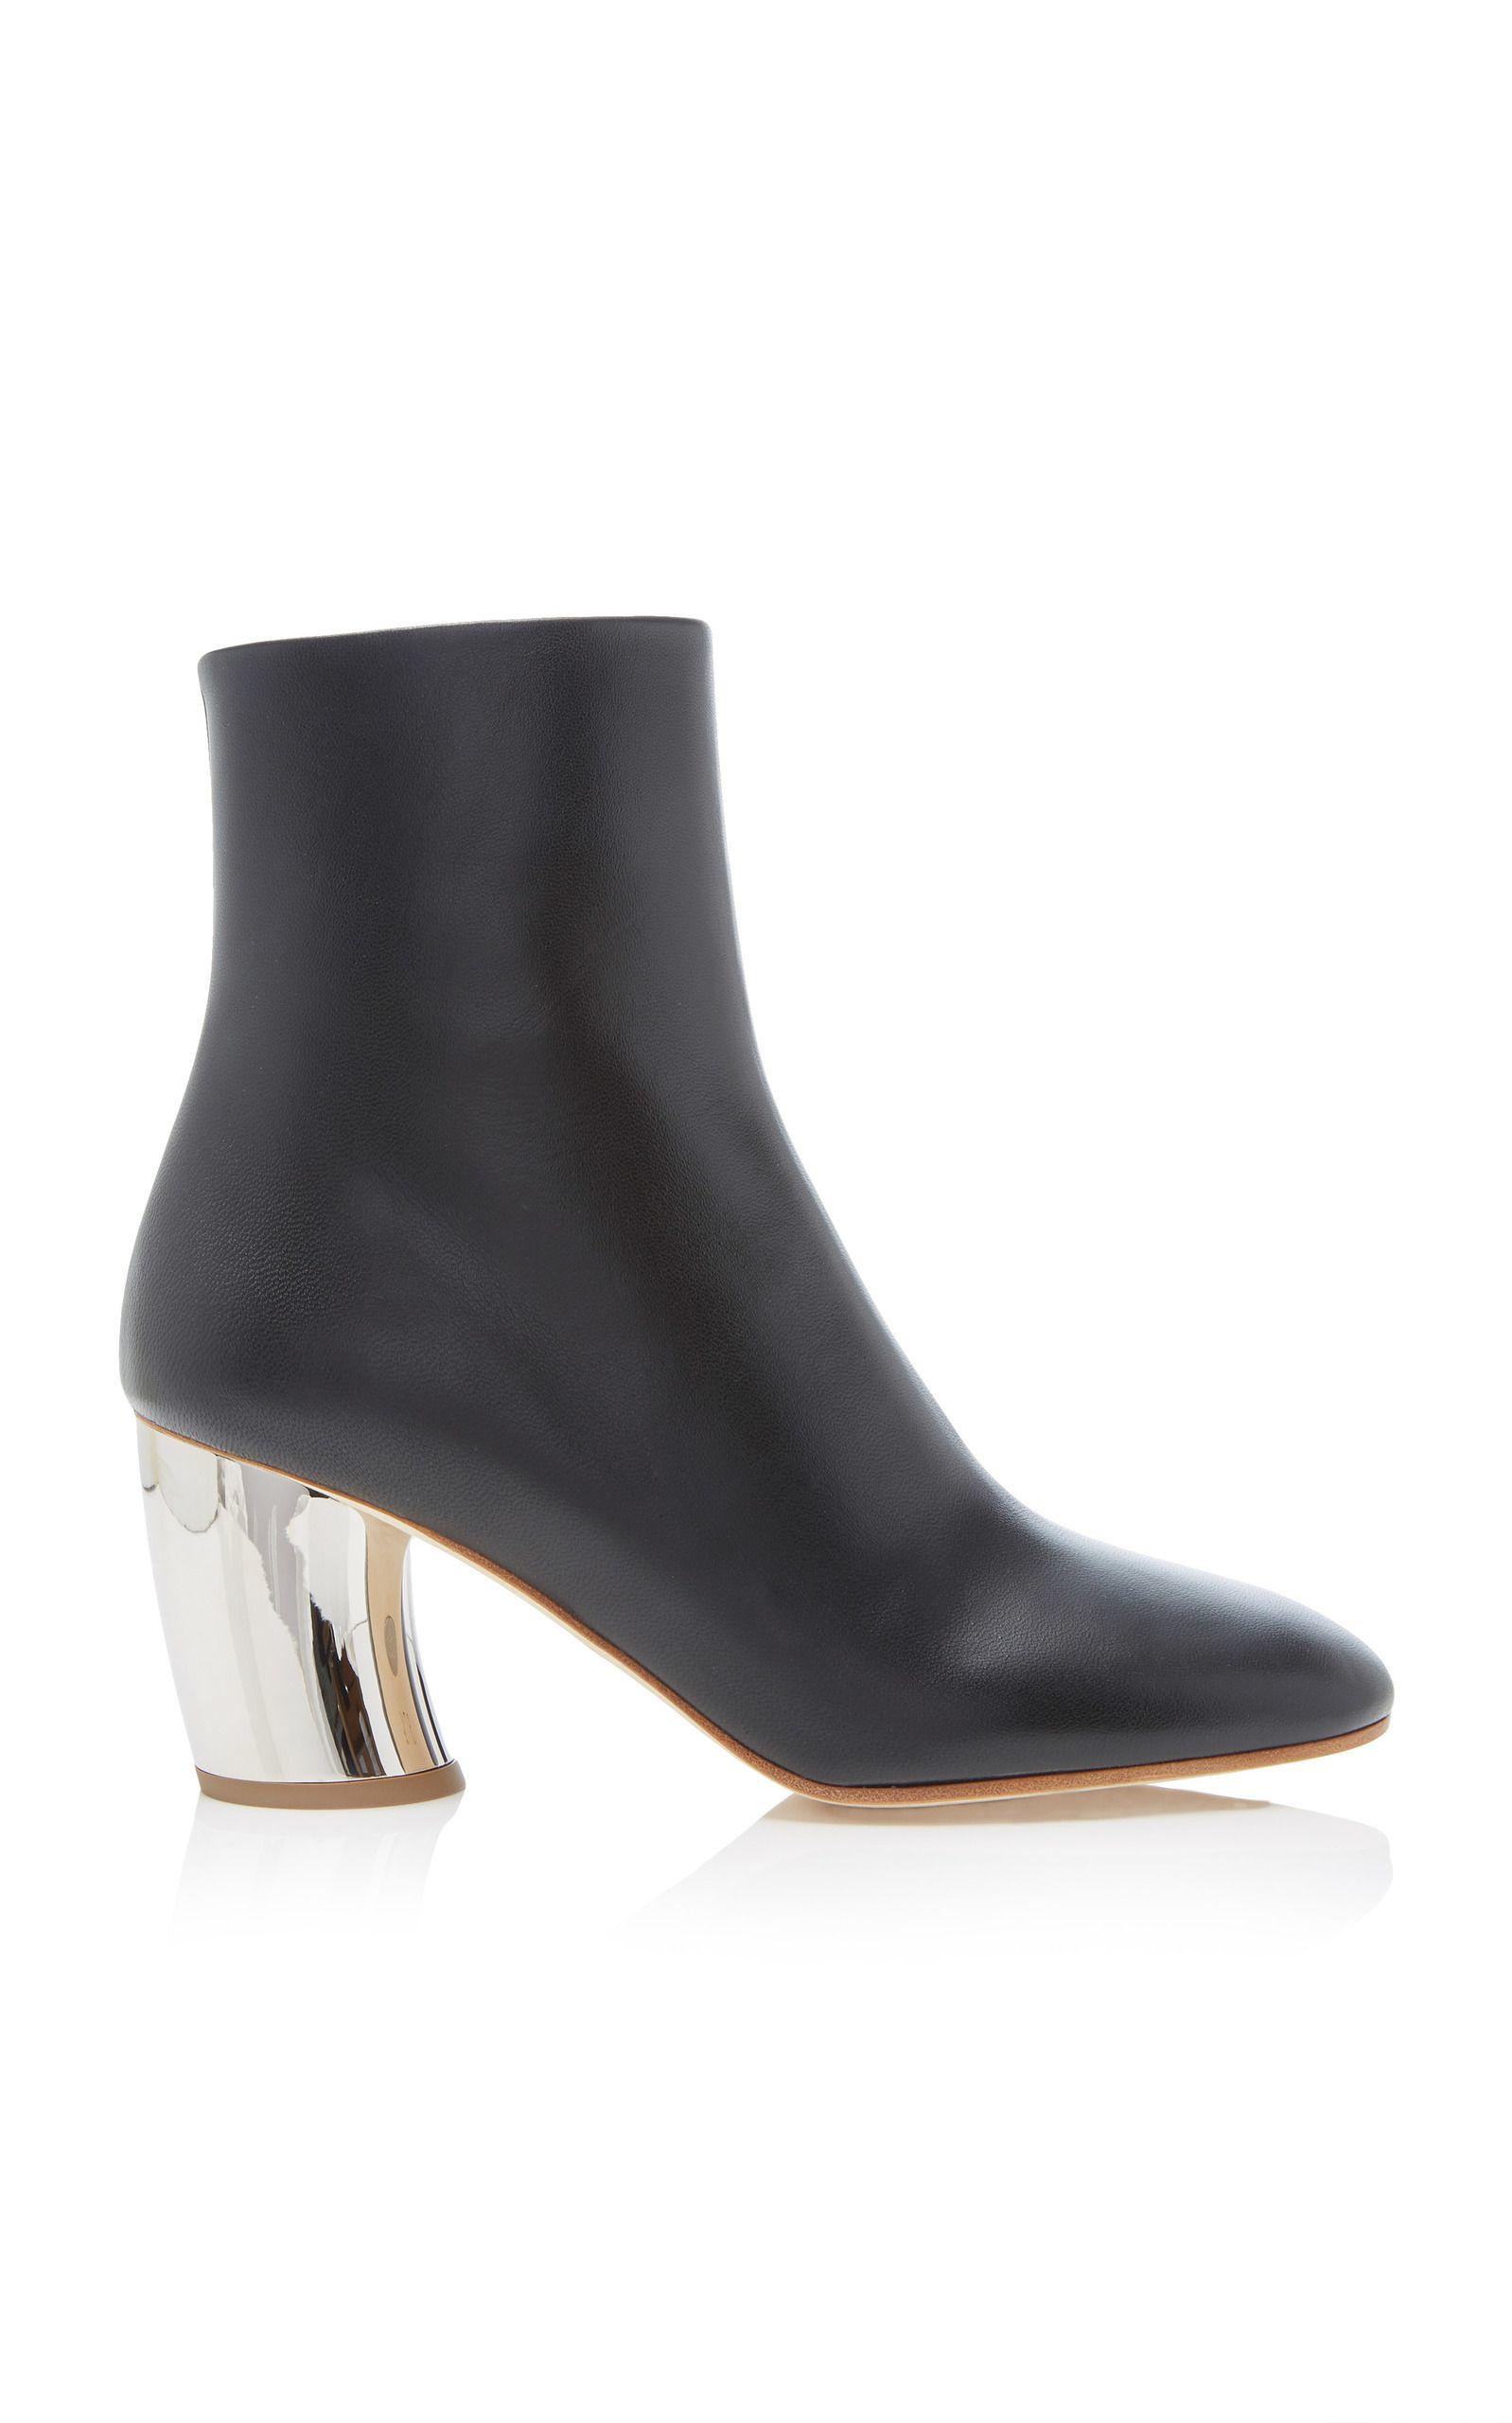 black boots with metallic heel